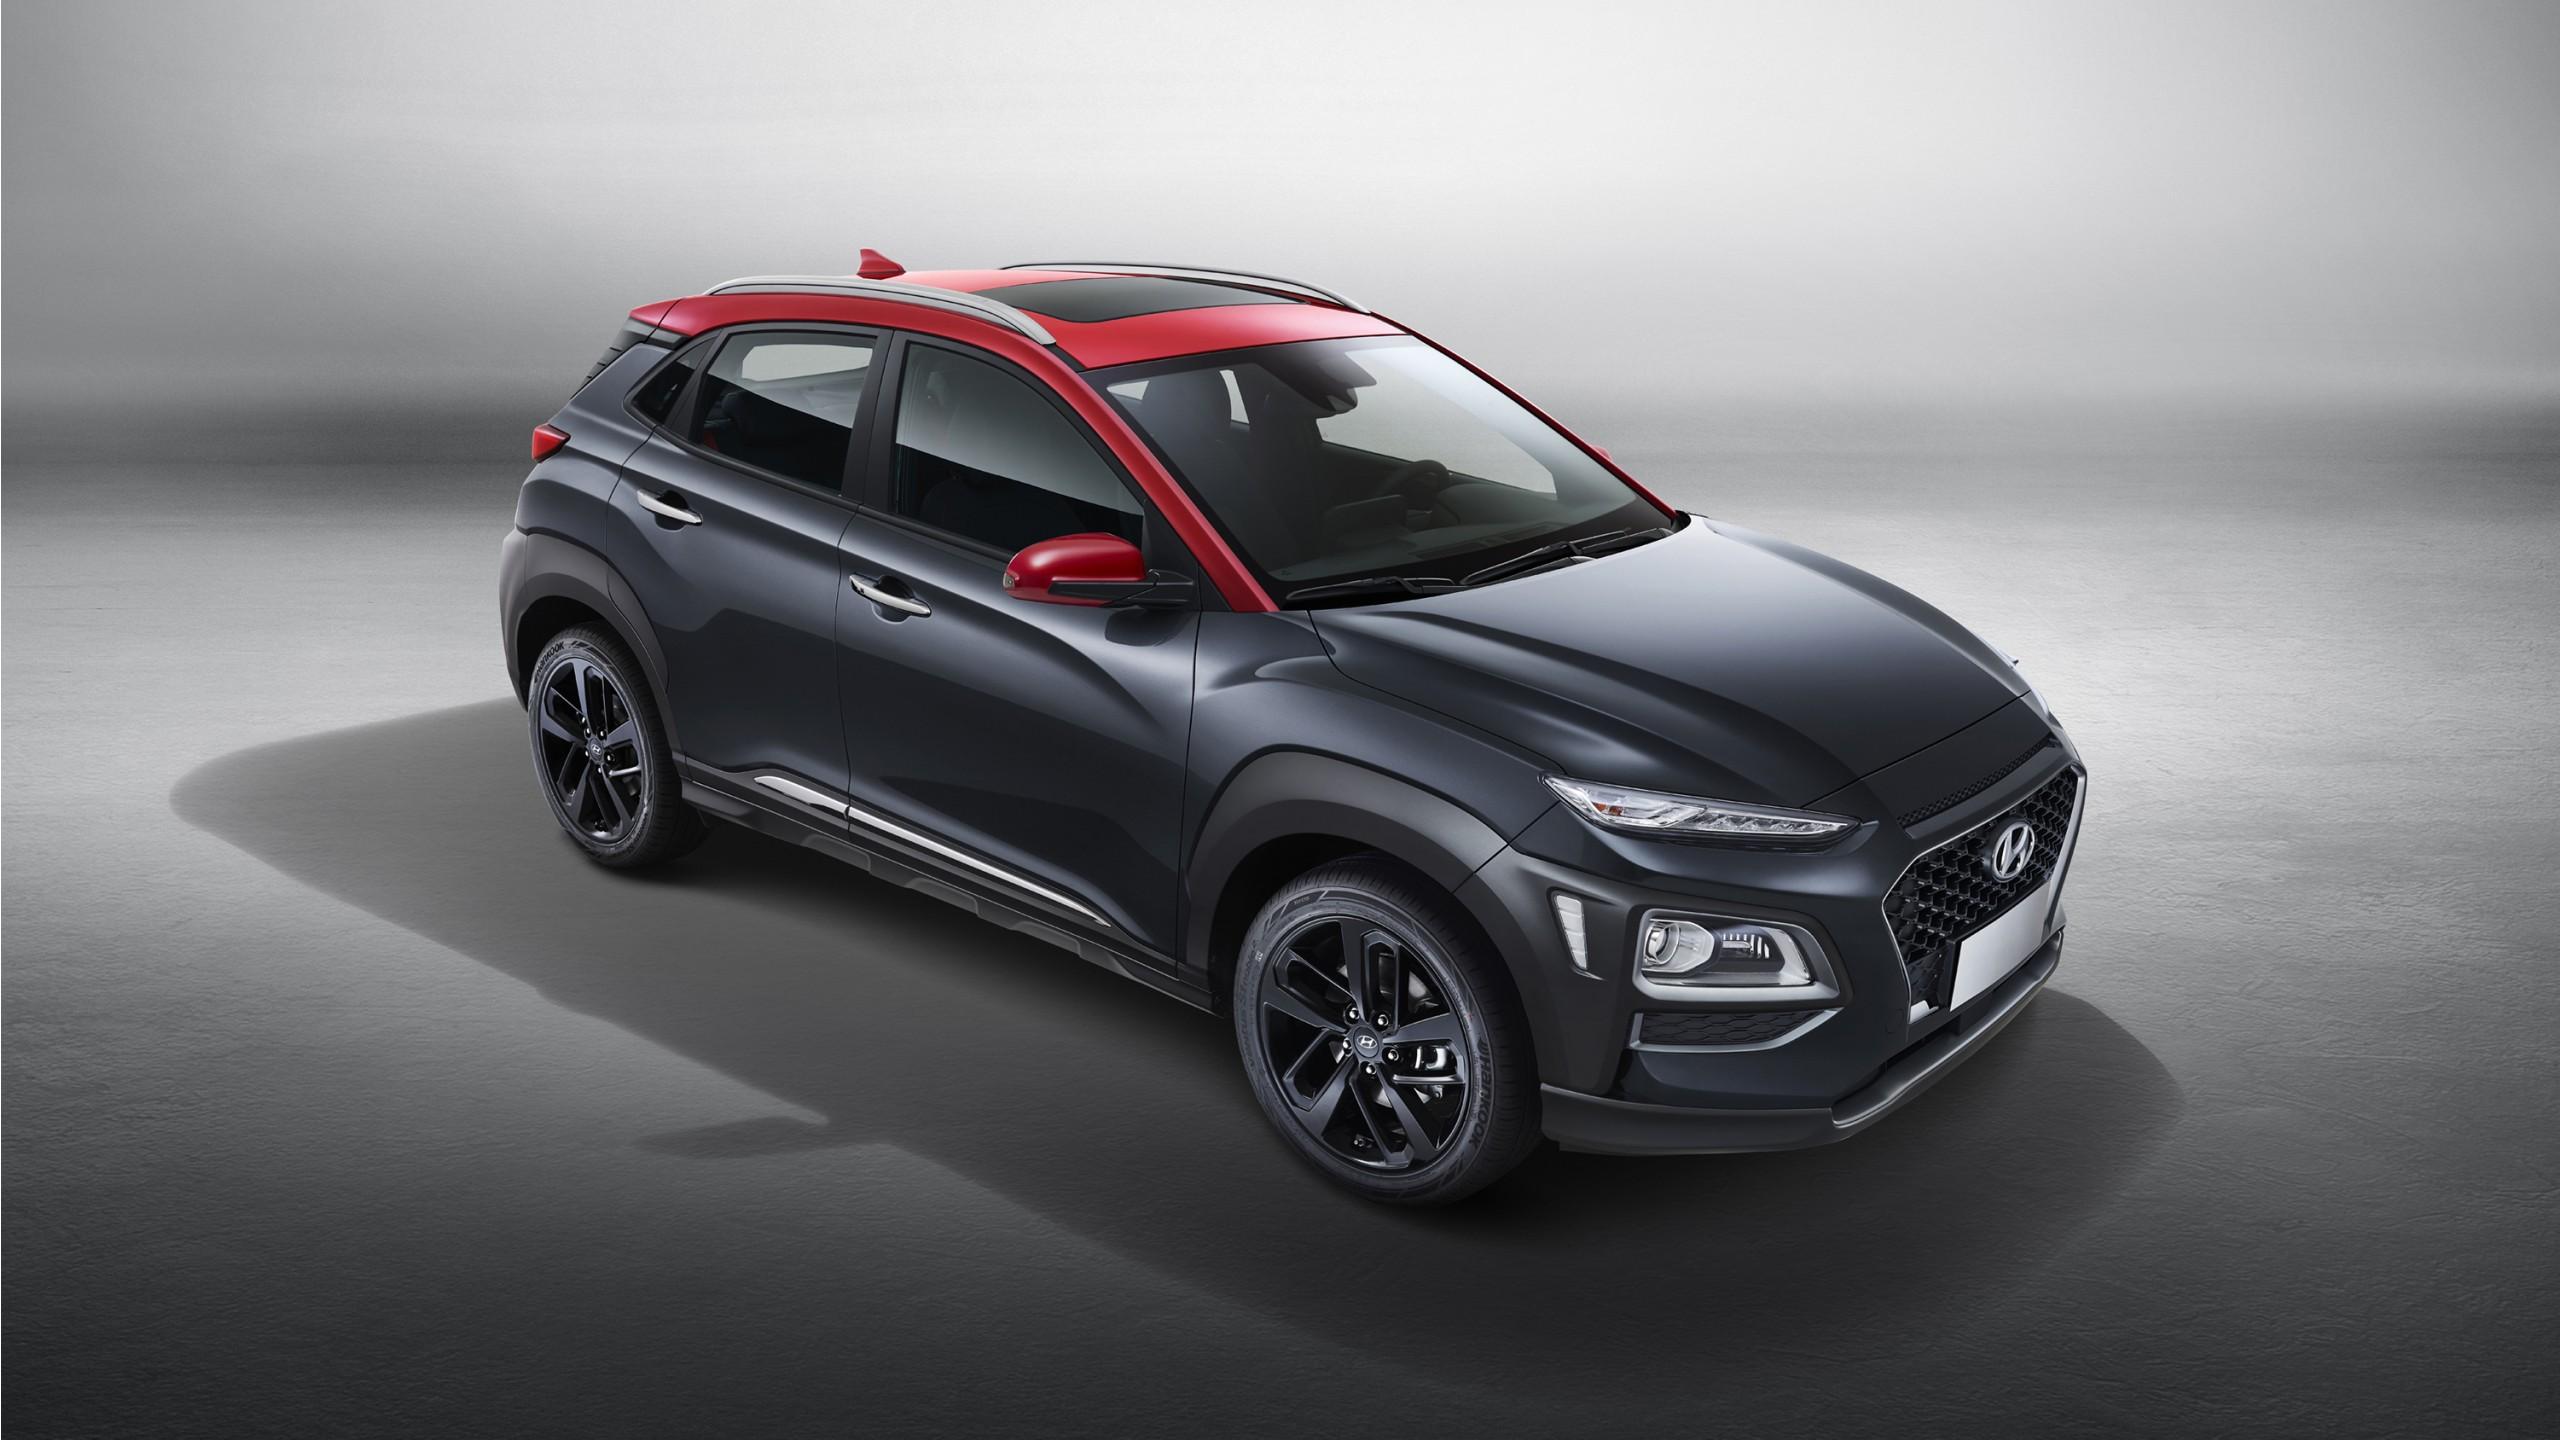 Hyundai Encino 2019 4K Wallpaper | HD Car Wallpapers | ID ...